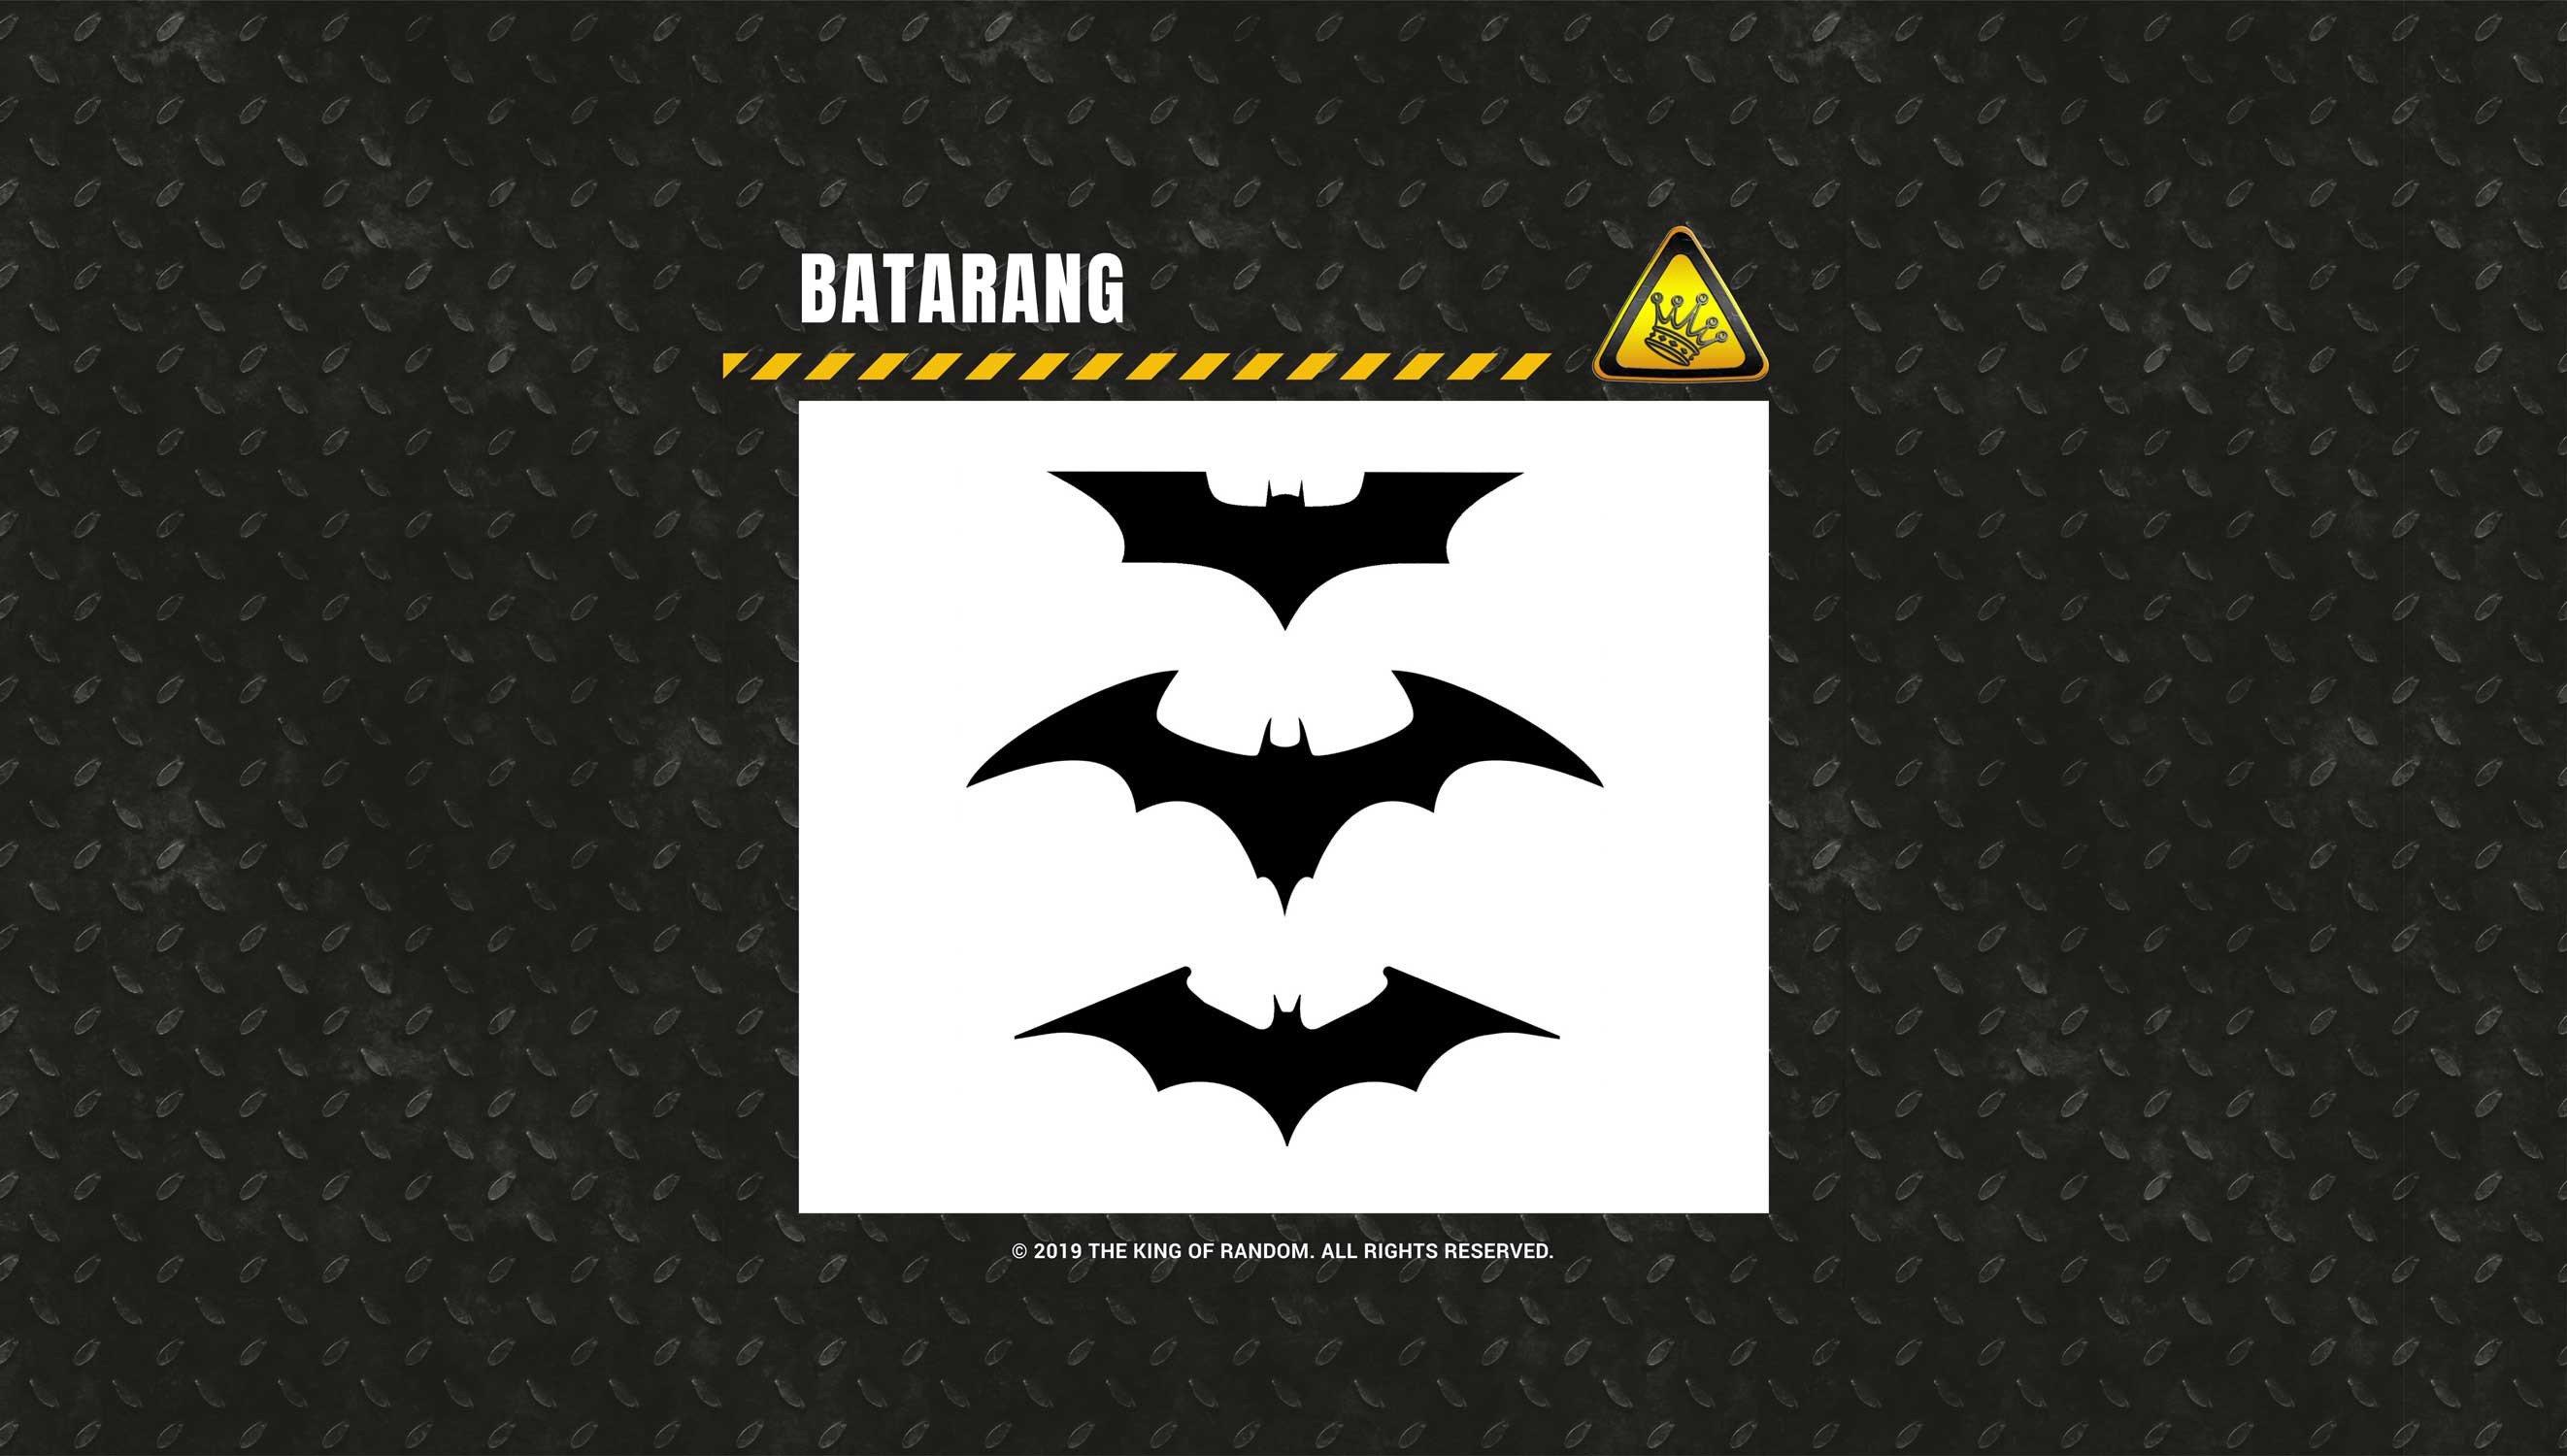 Batarang Template Pdf Batarang Template the King Of Random